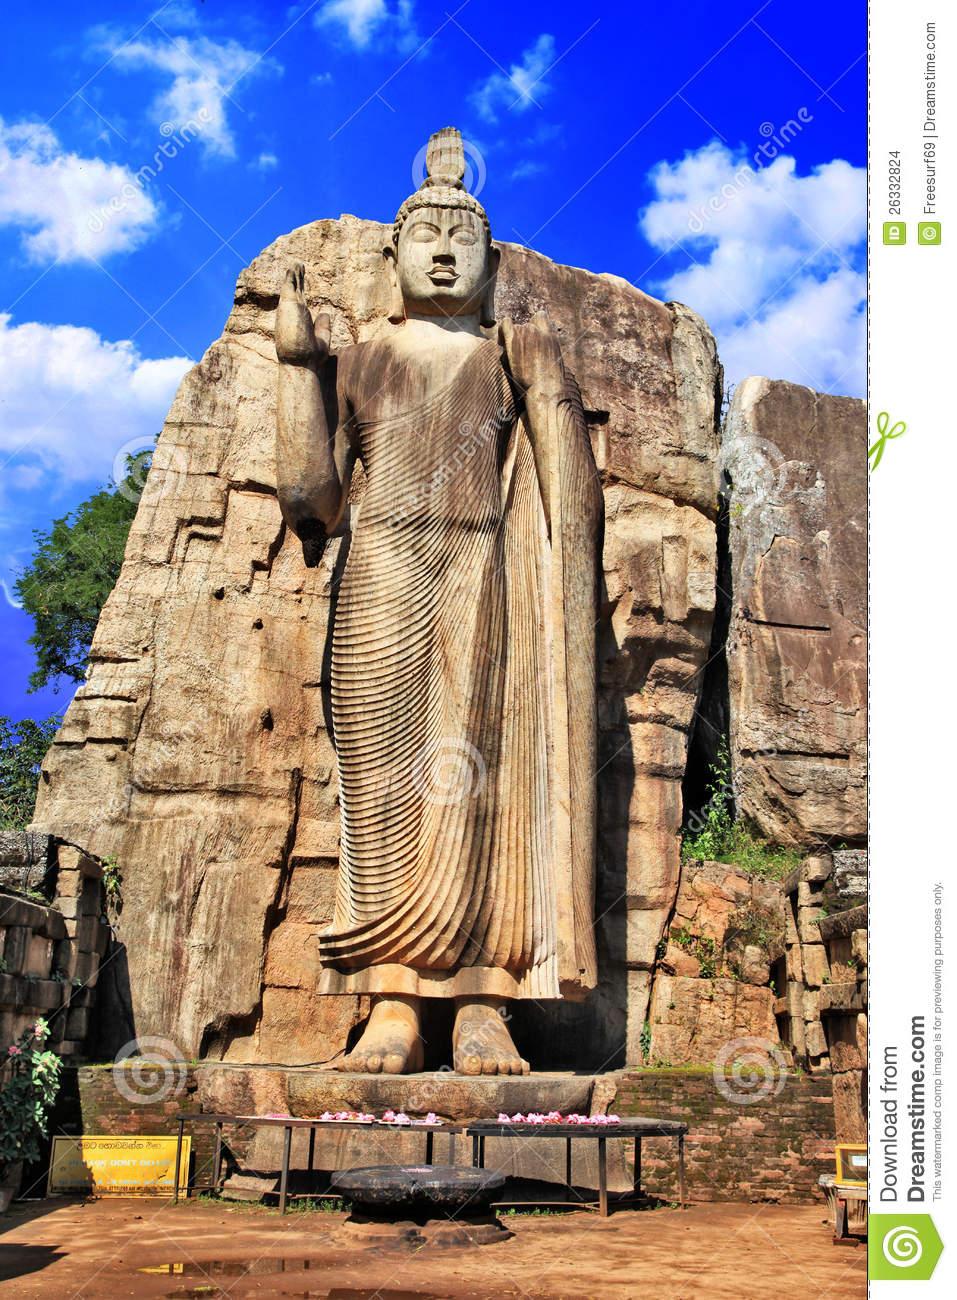 Buddha Monolith Statue Stock Images.